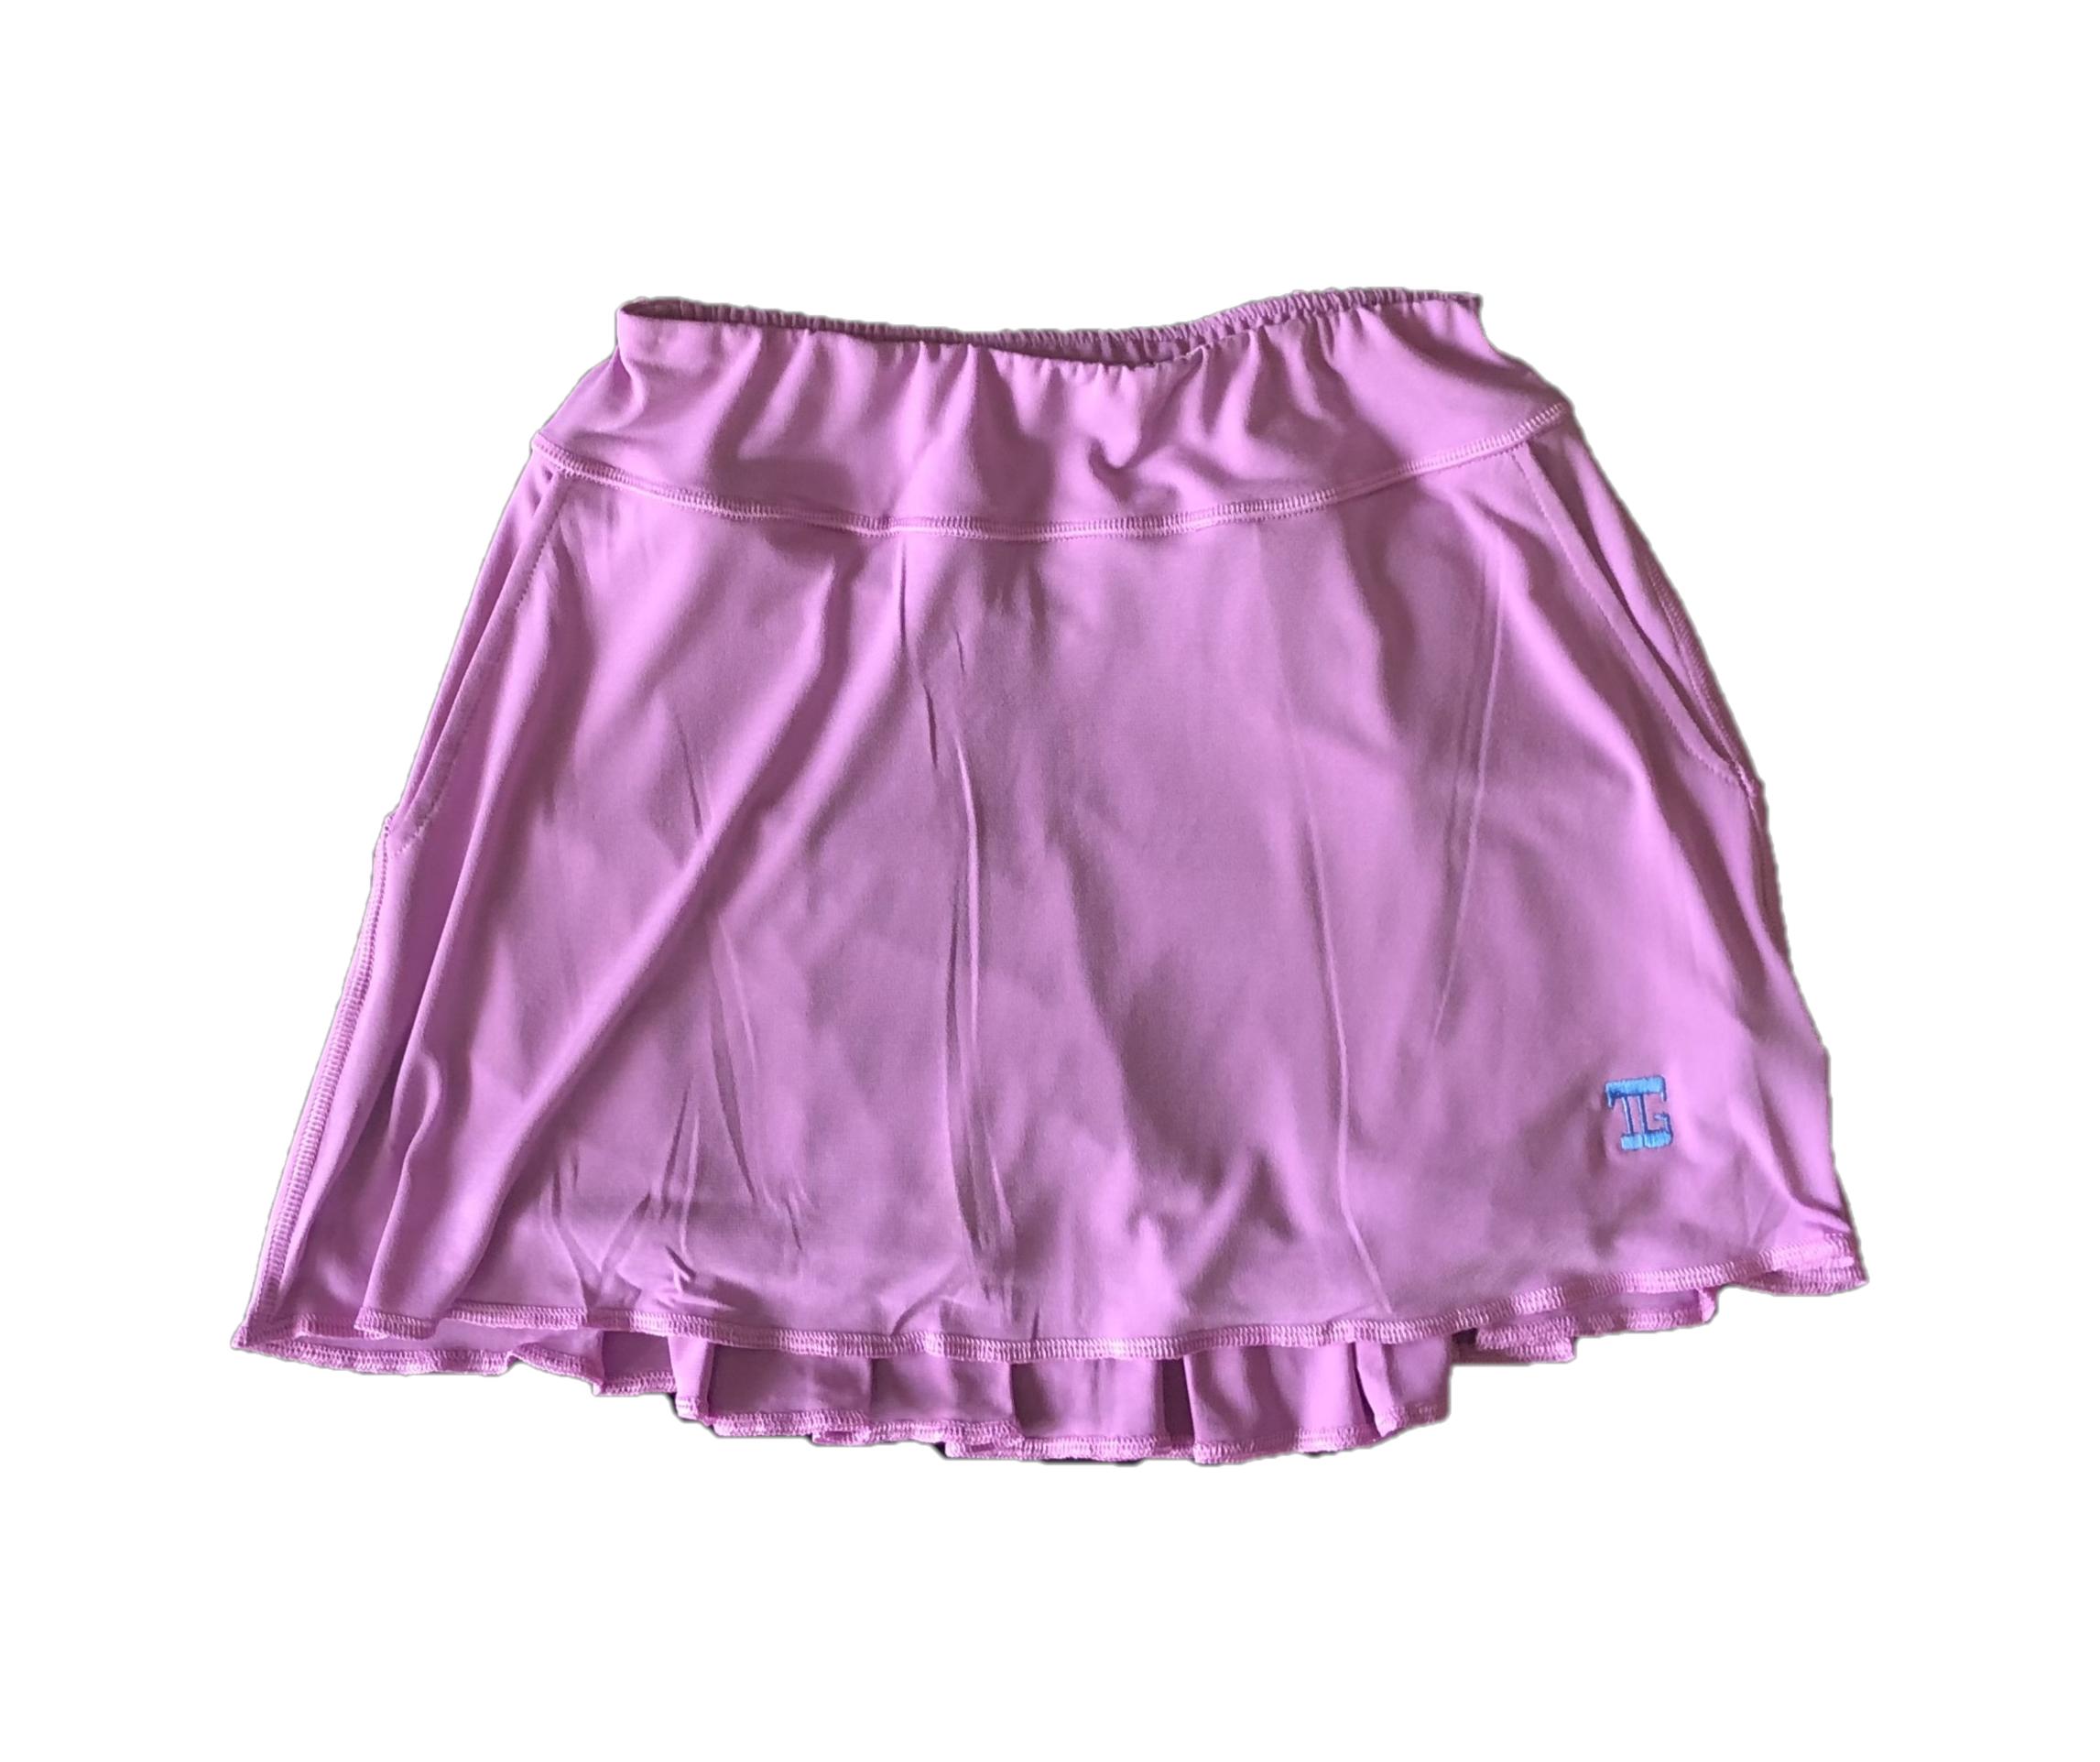 LS-042G    Skirt Soft Feel Lavender With Rear Swing Pleat Panel 2 Side Pockets & Light Green  Overlock Trim